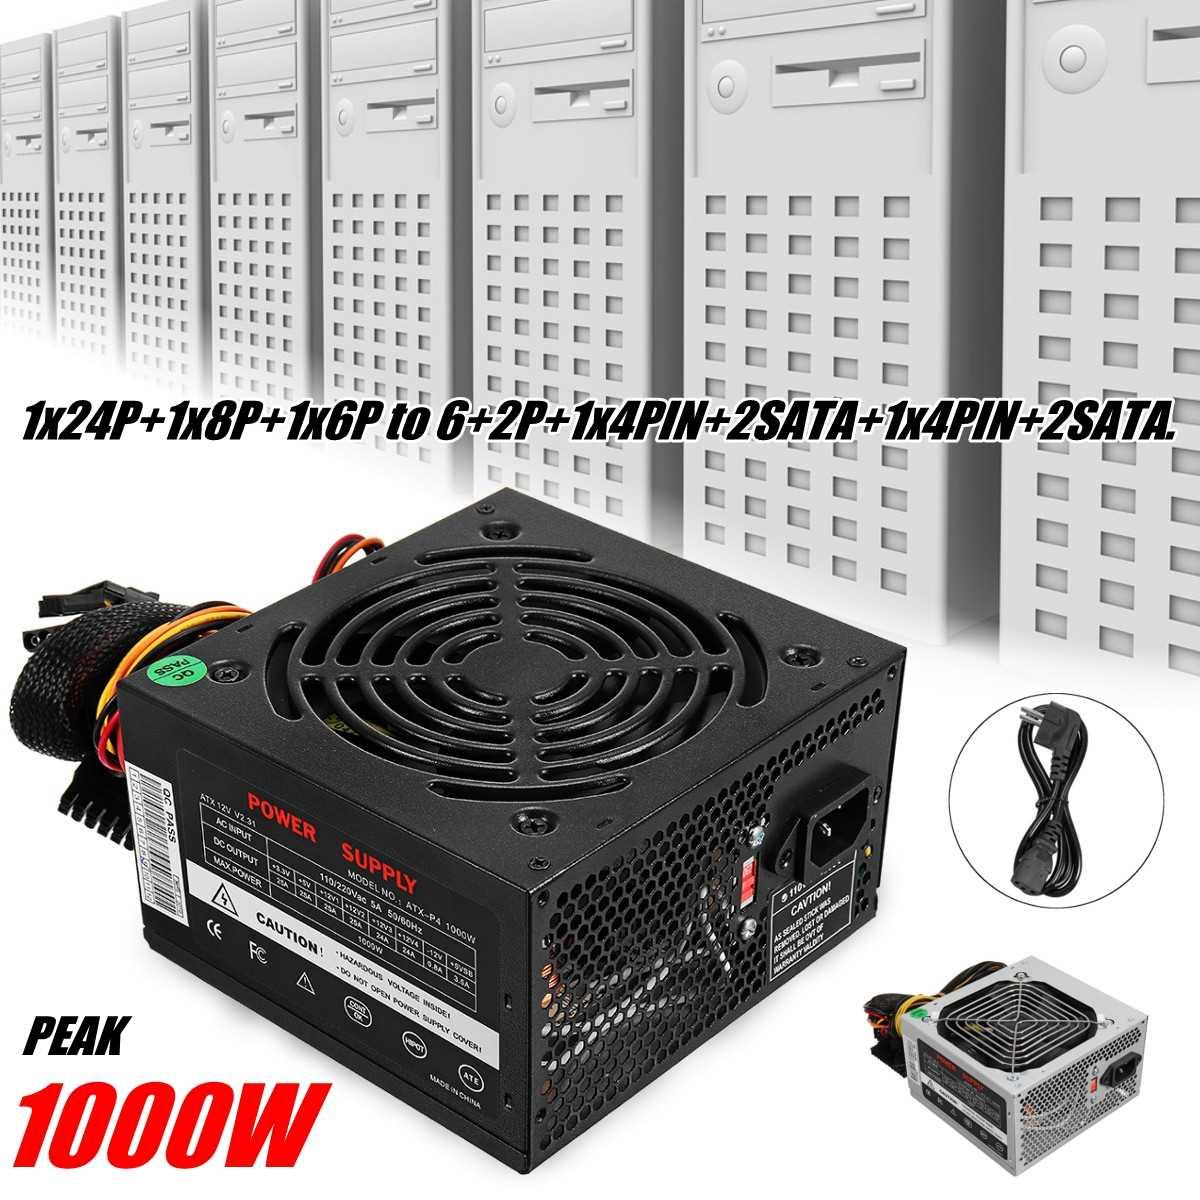 Max 1000W alimentation PSU PFC ventilateur silencieux ATX 24pin 12V PC ordinateur SATA Gaming PC alimentation pour ordinateur Intel AMD